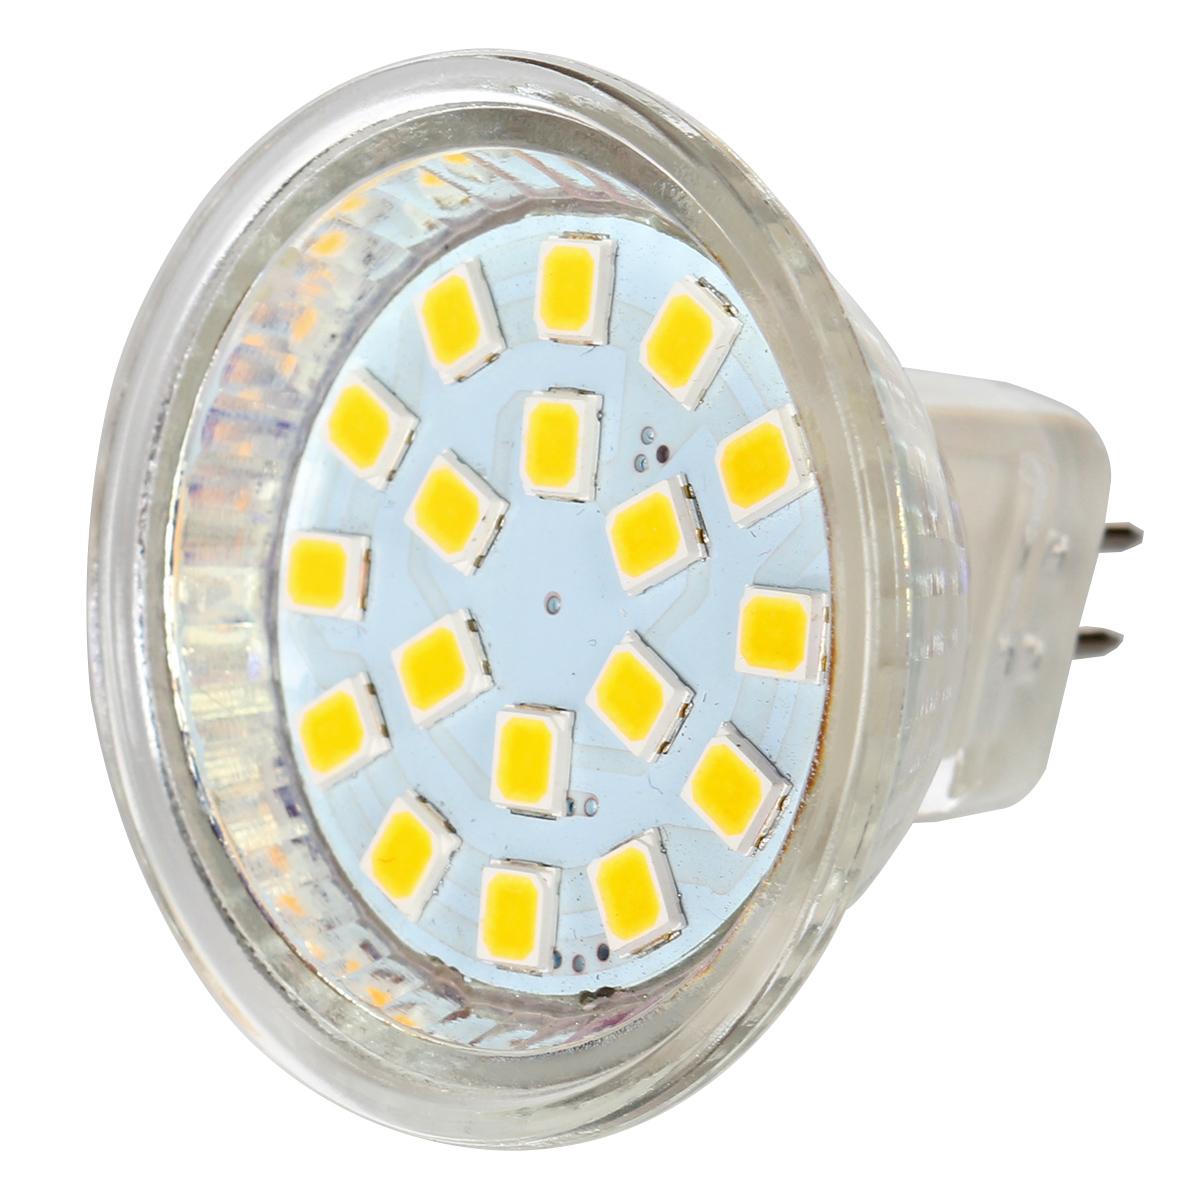 MR11 GU4 DC12V LED 2W 3W 4W LED Spot Lamp Light Bulbs A 35mm Diameter